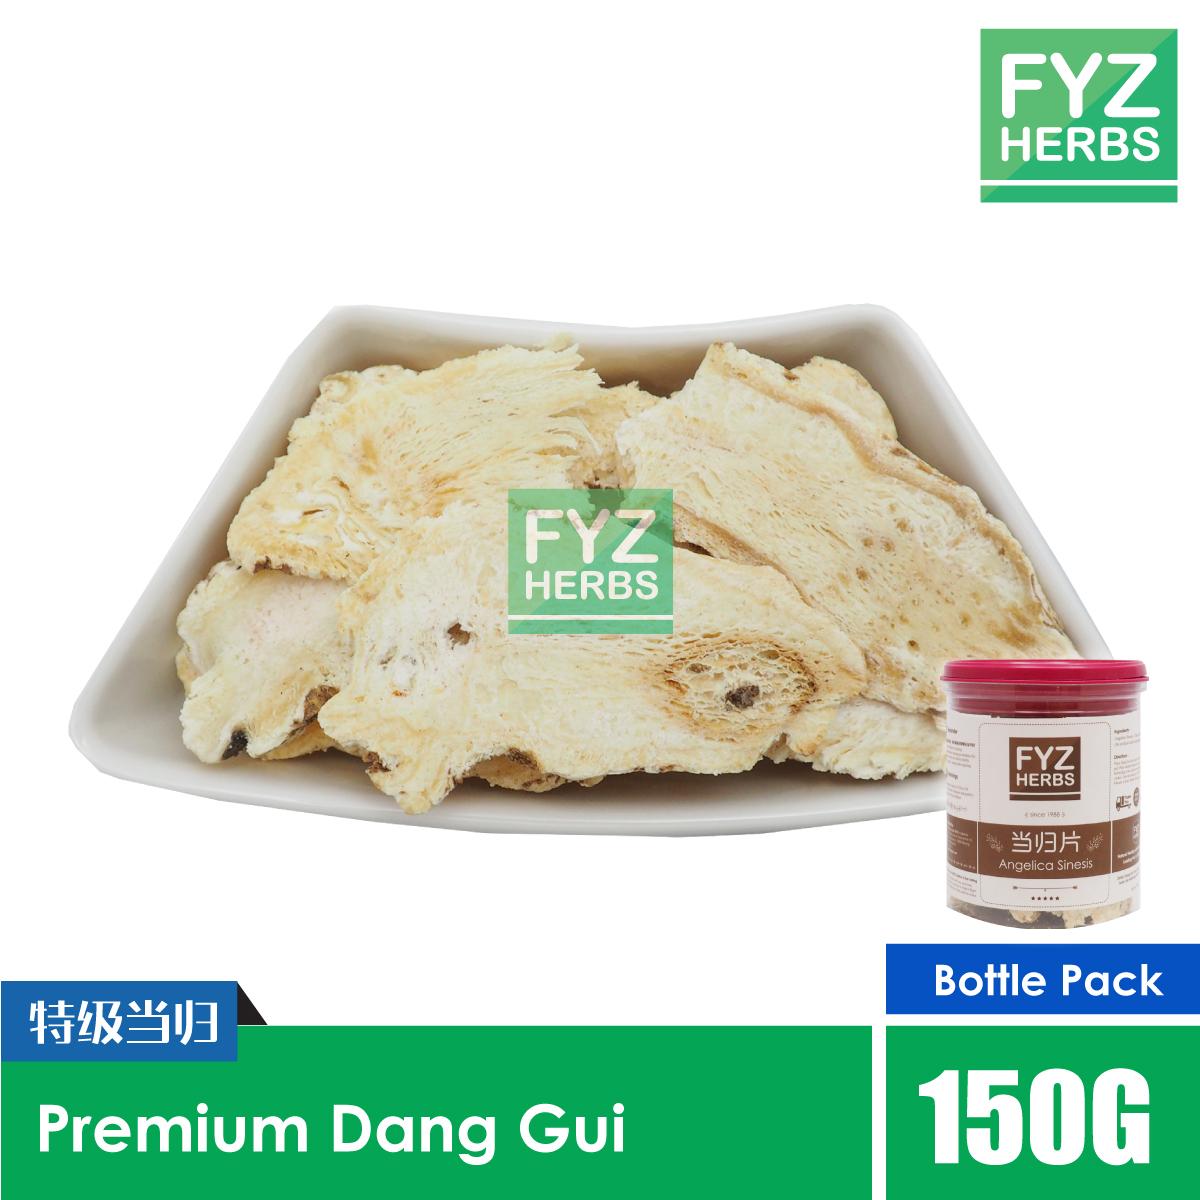 FYZ Herbs Premium Dang Gui Dong Guai Angelica Sinesis 150g [Bottle Pack] 当归原粒切片罐装 150g